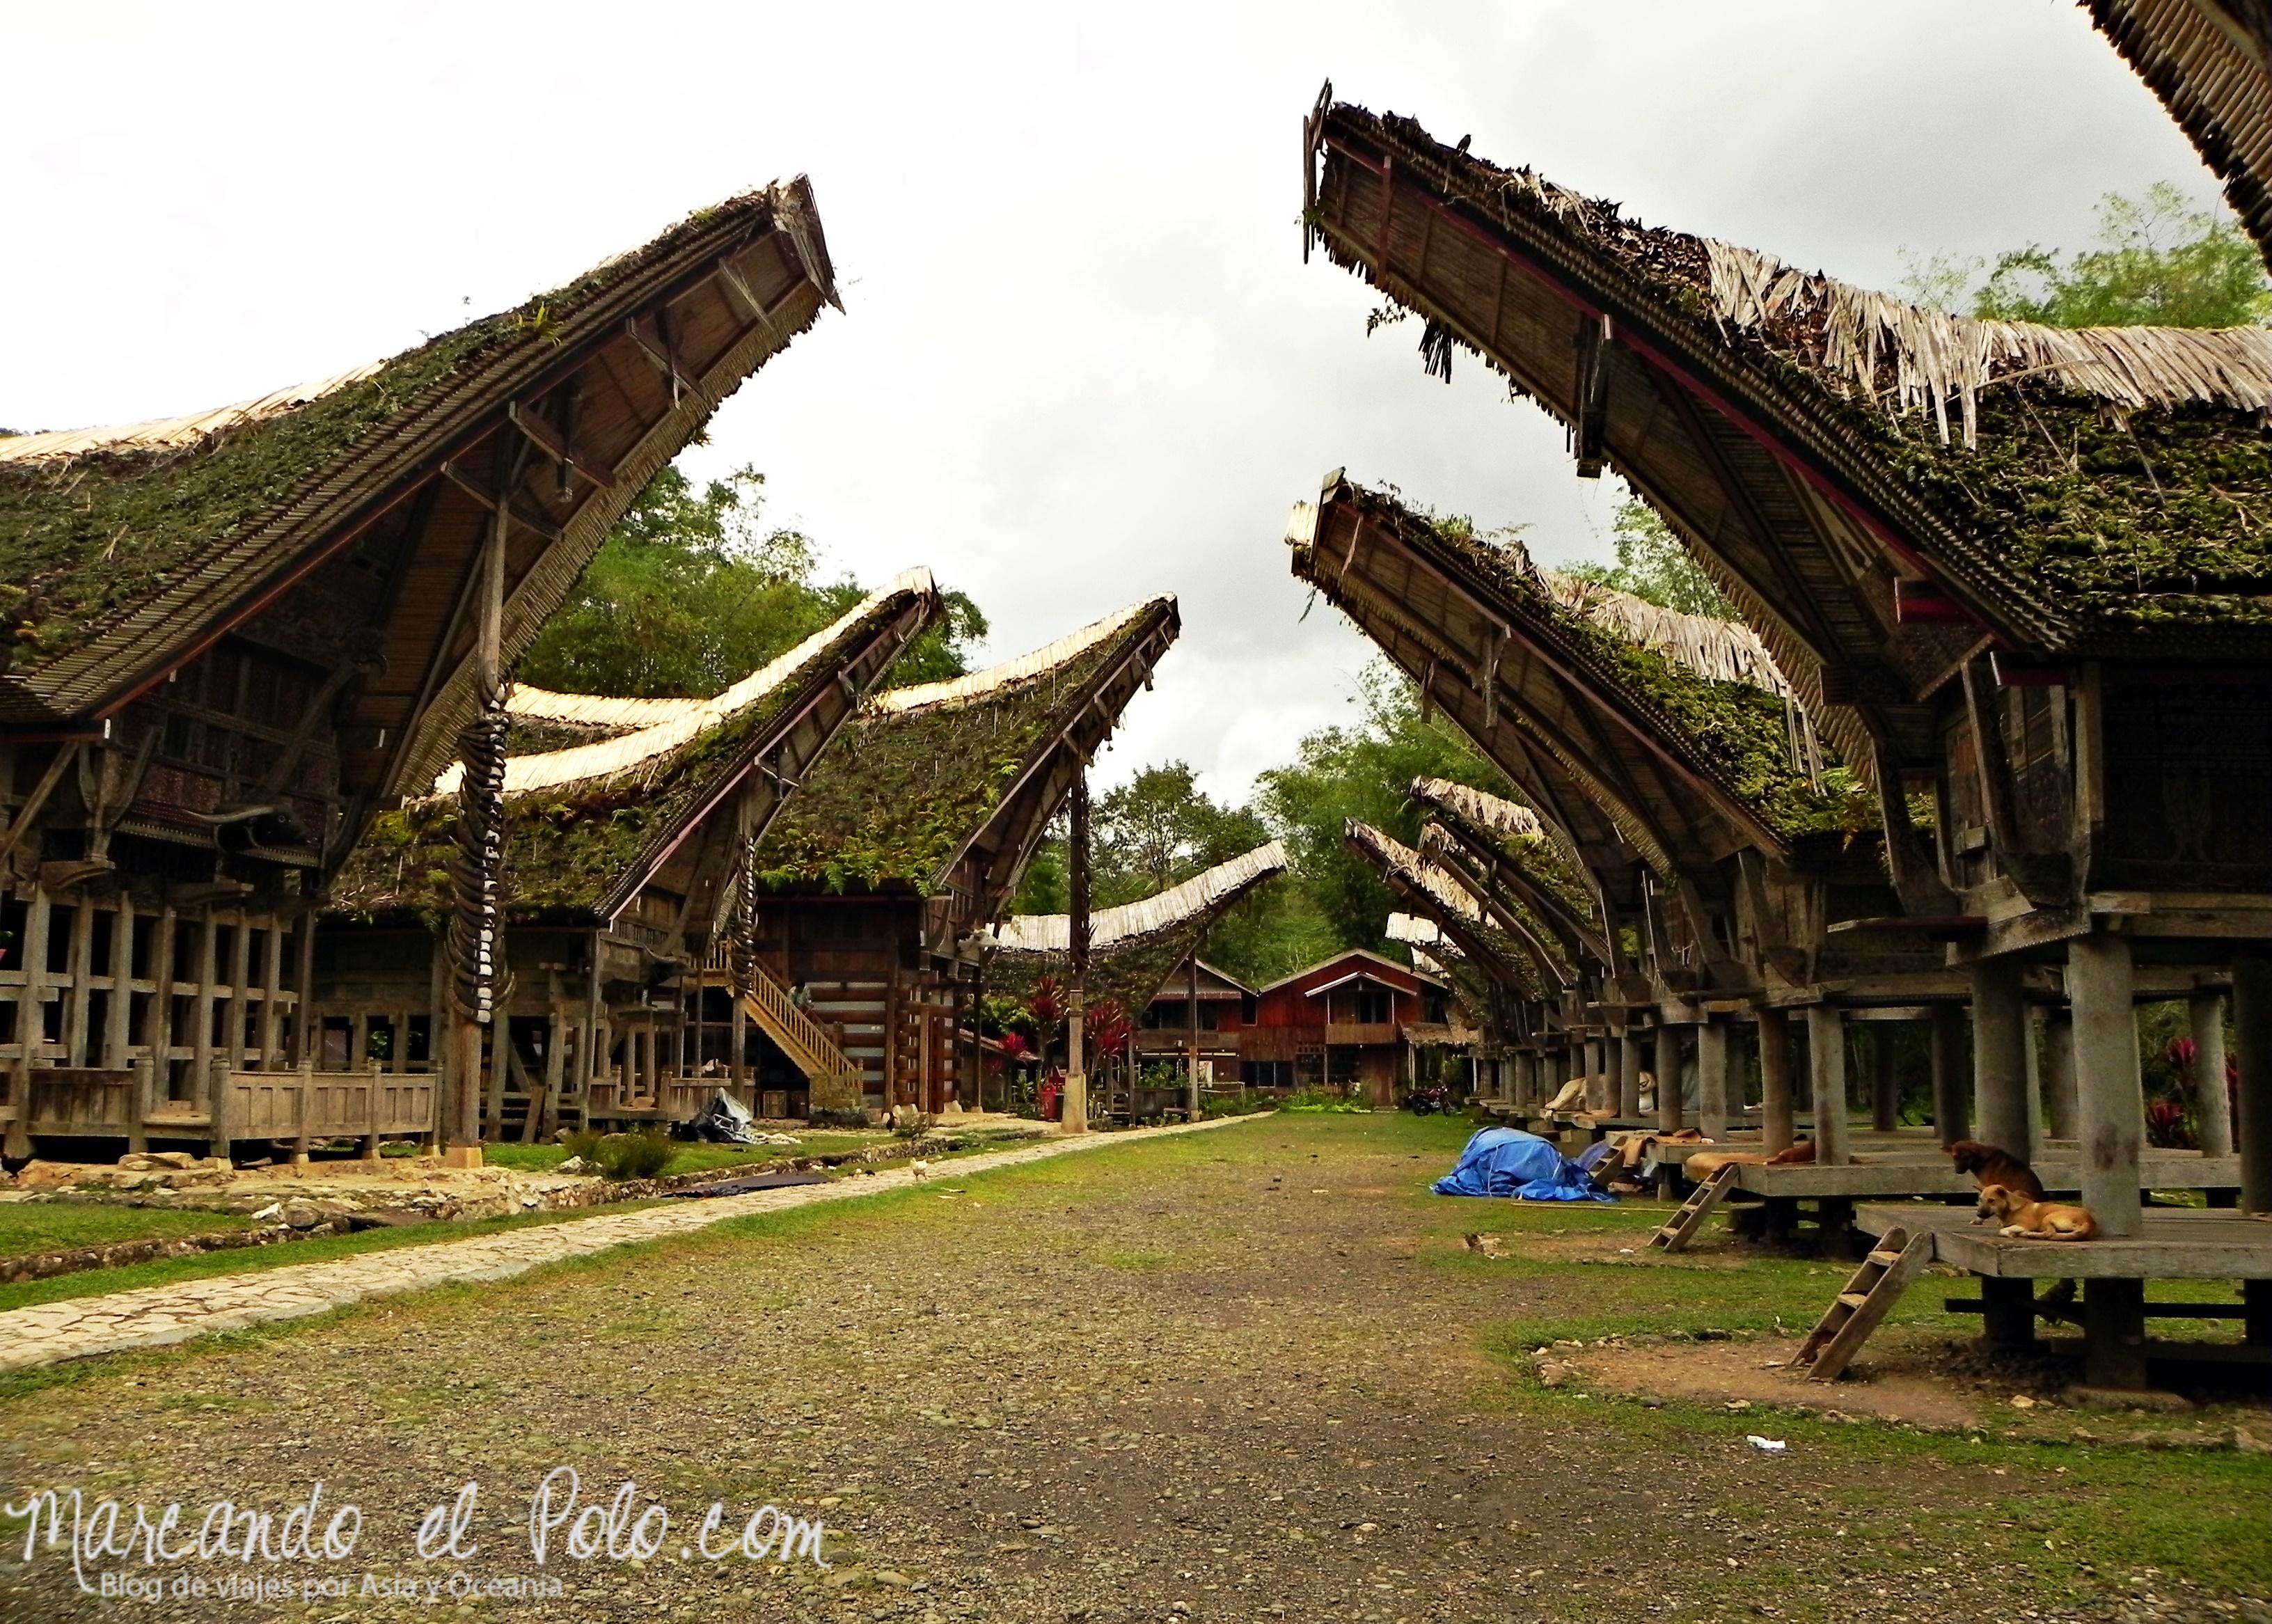 Viajar a Indonesia - Tana Toraja, Sulawesi